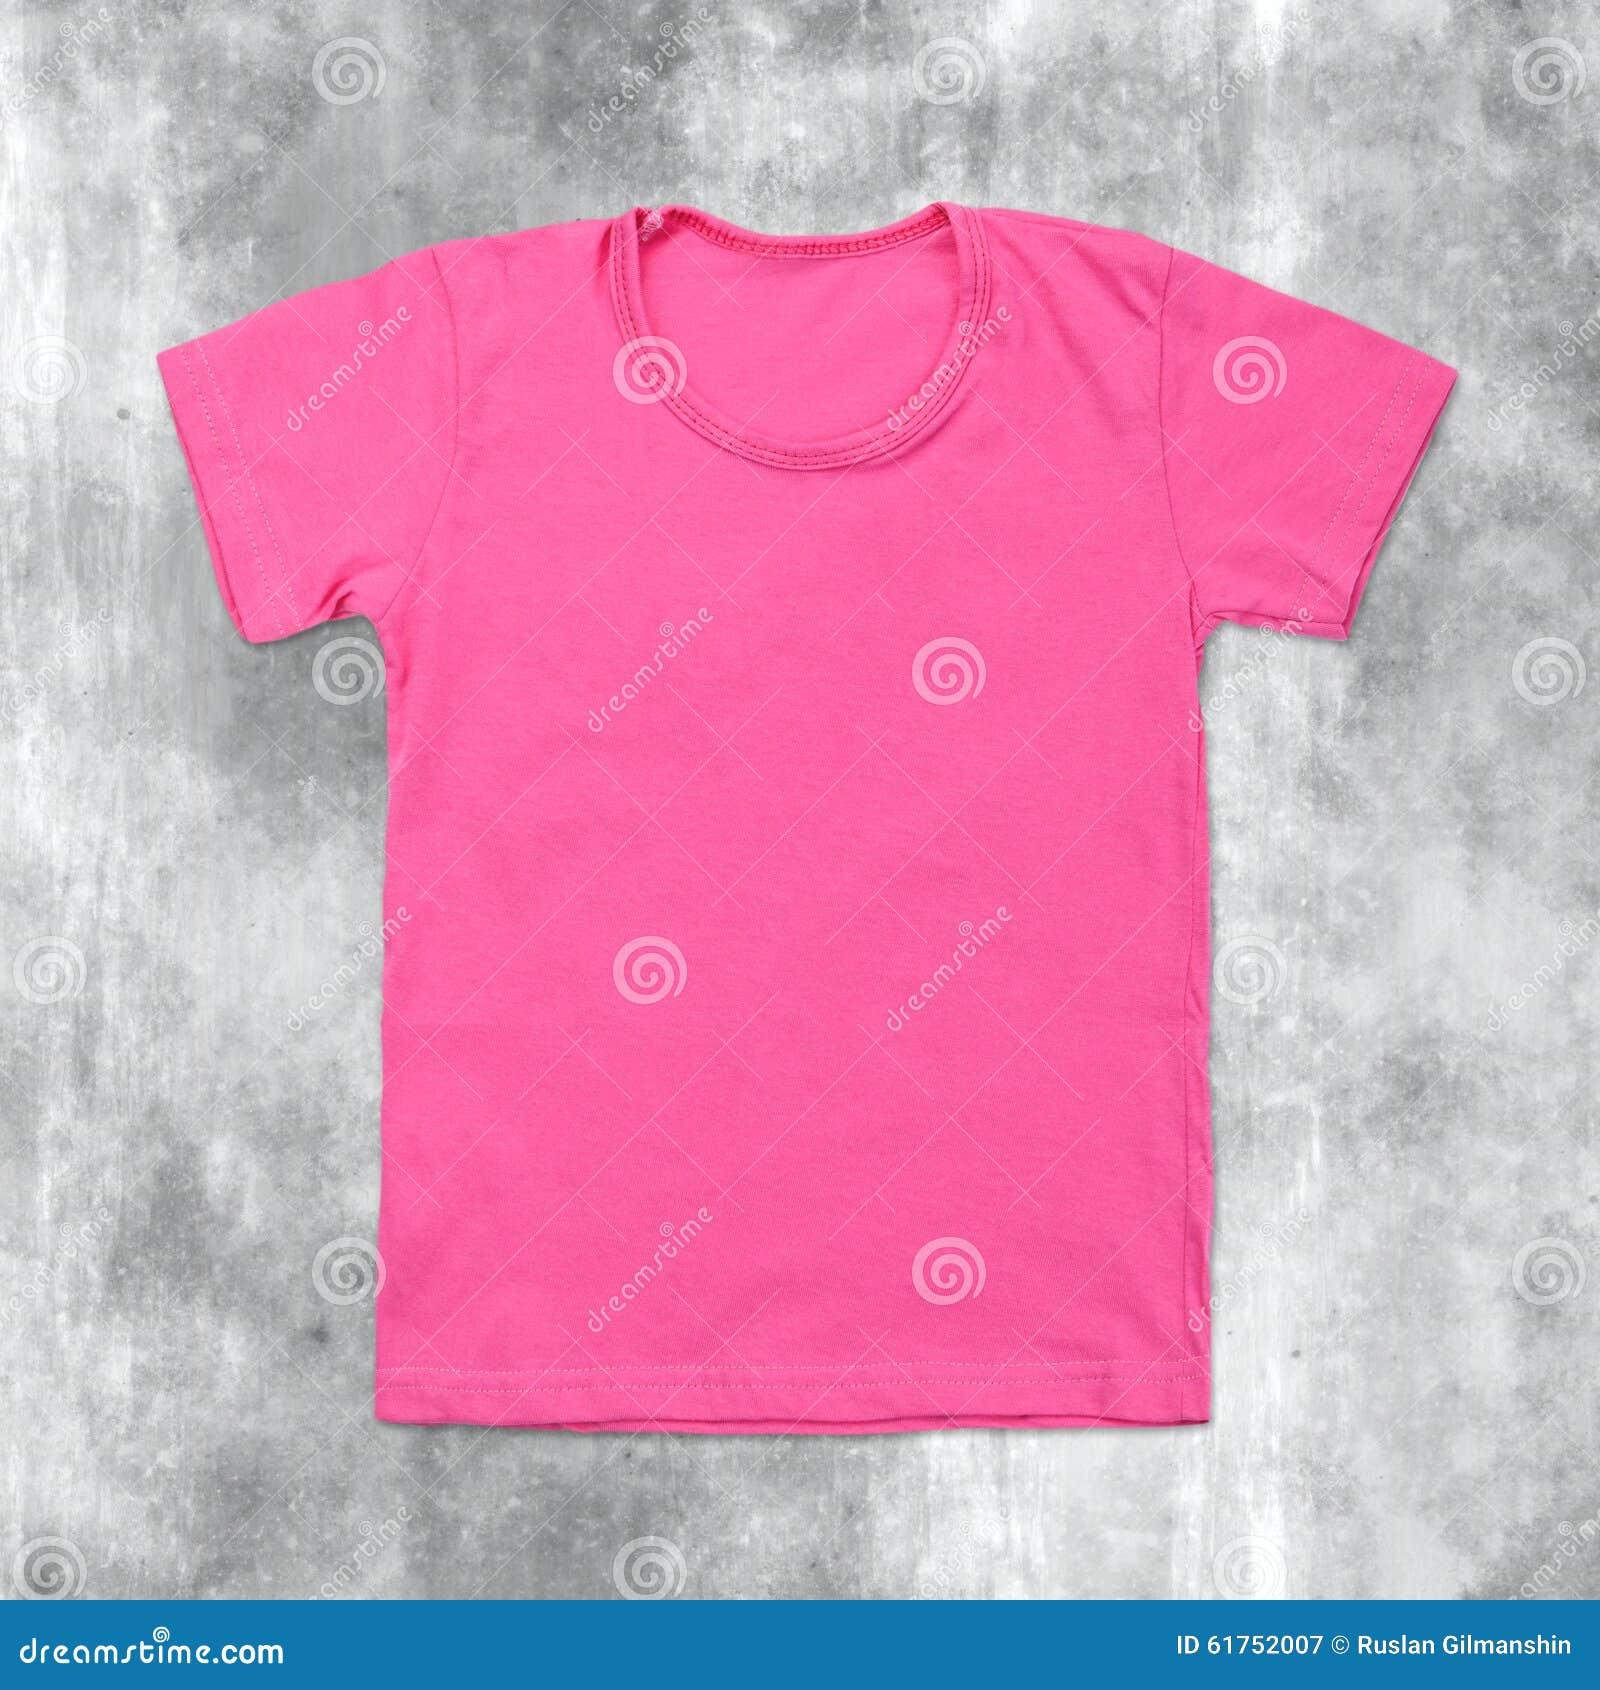 43f3f53b Pink Blank T-shirt On Dark Cracked Background Stock Image - Image of ...